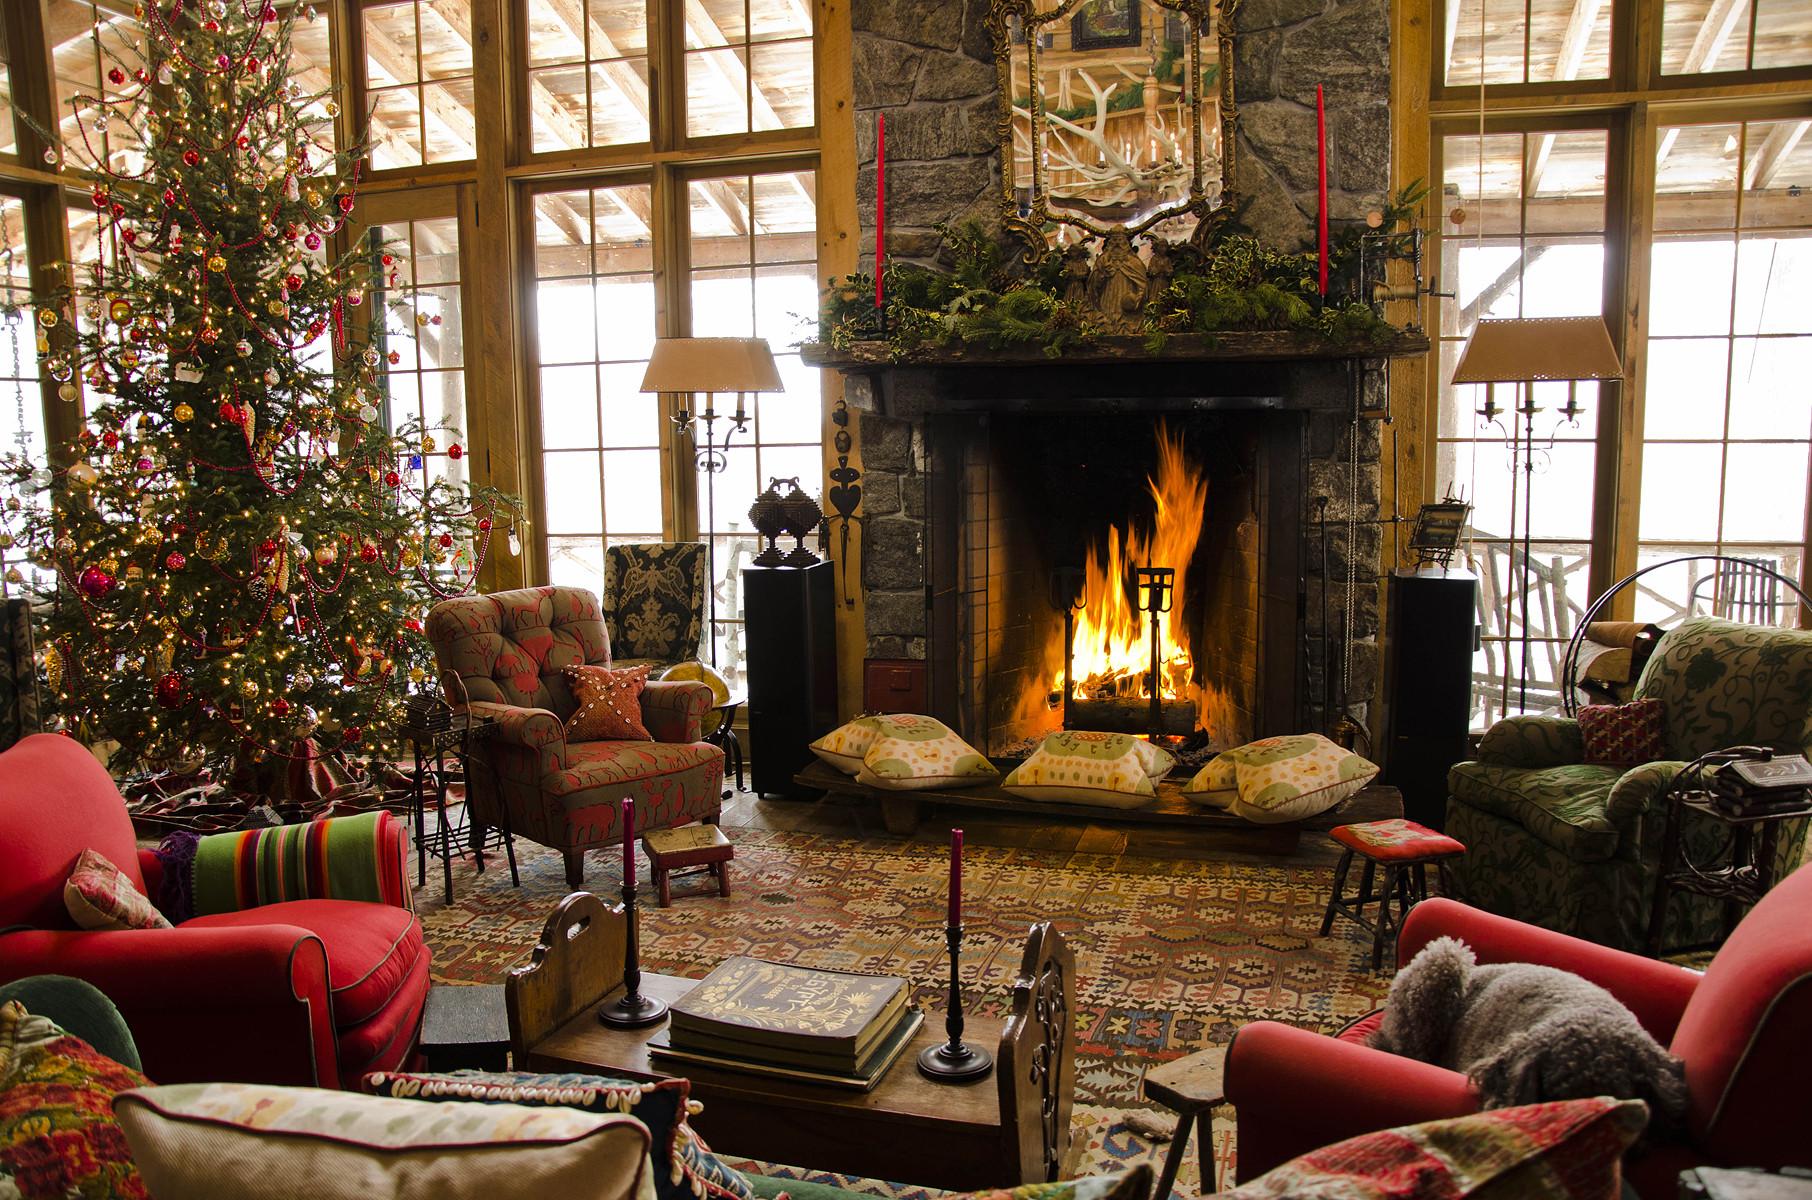 Christmas Themed Fireplace Screen  12 Christmas Fireplace s Ideas